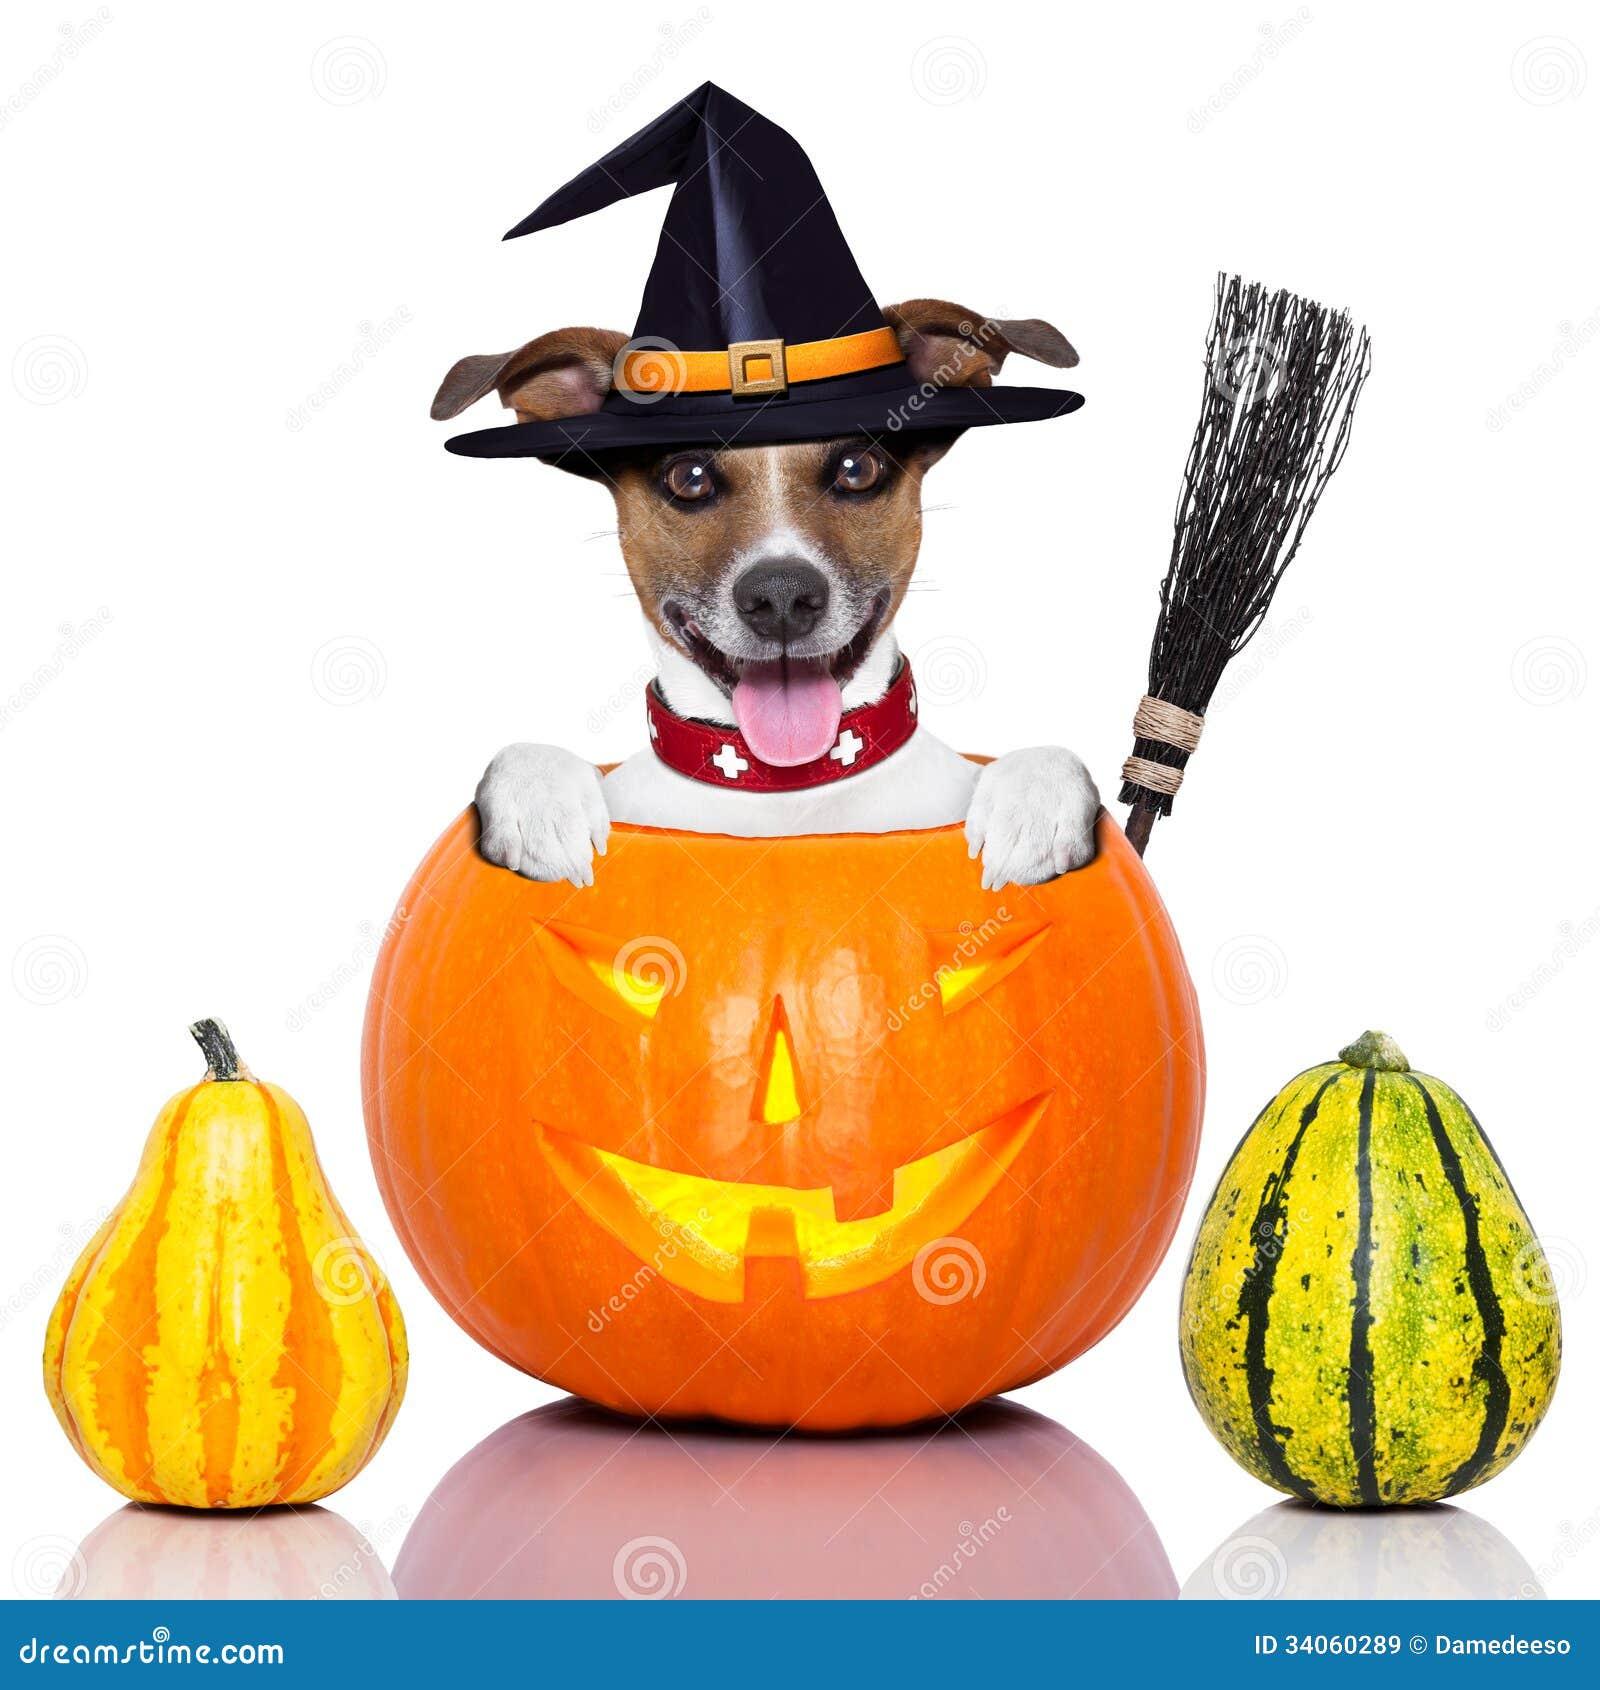 Broom Halloween